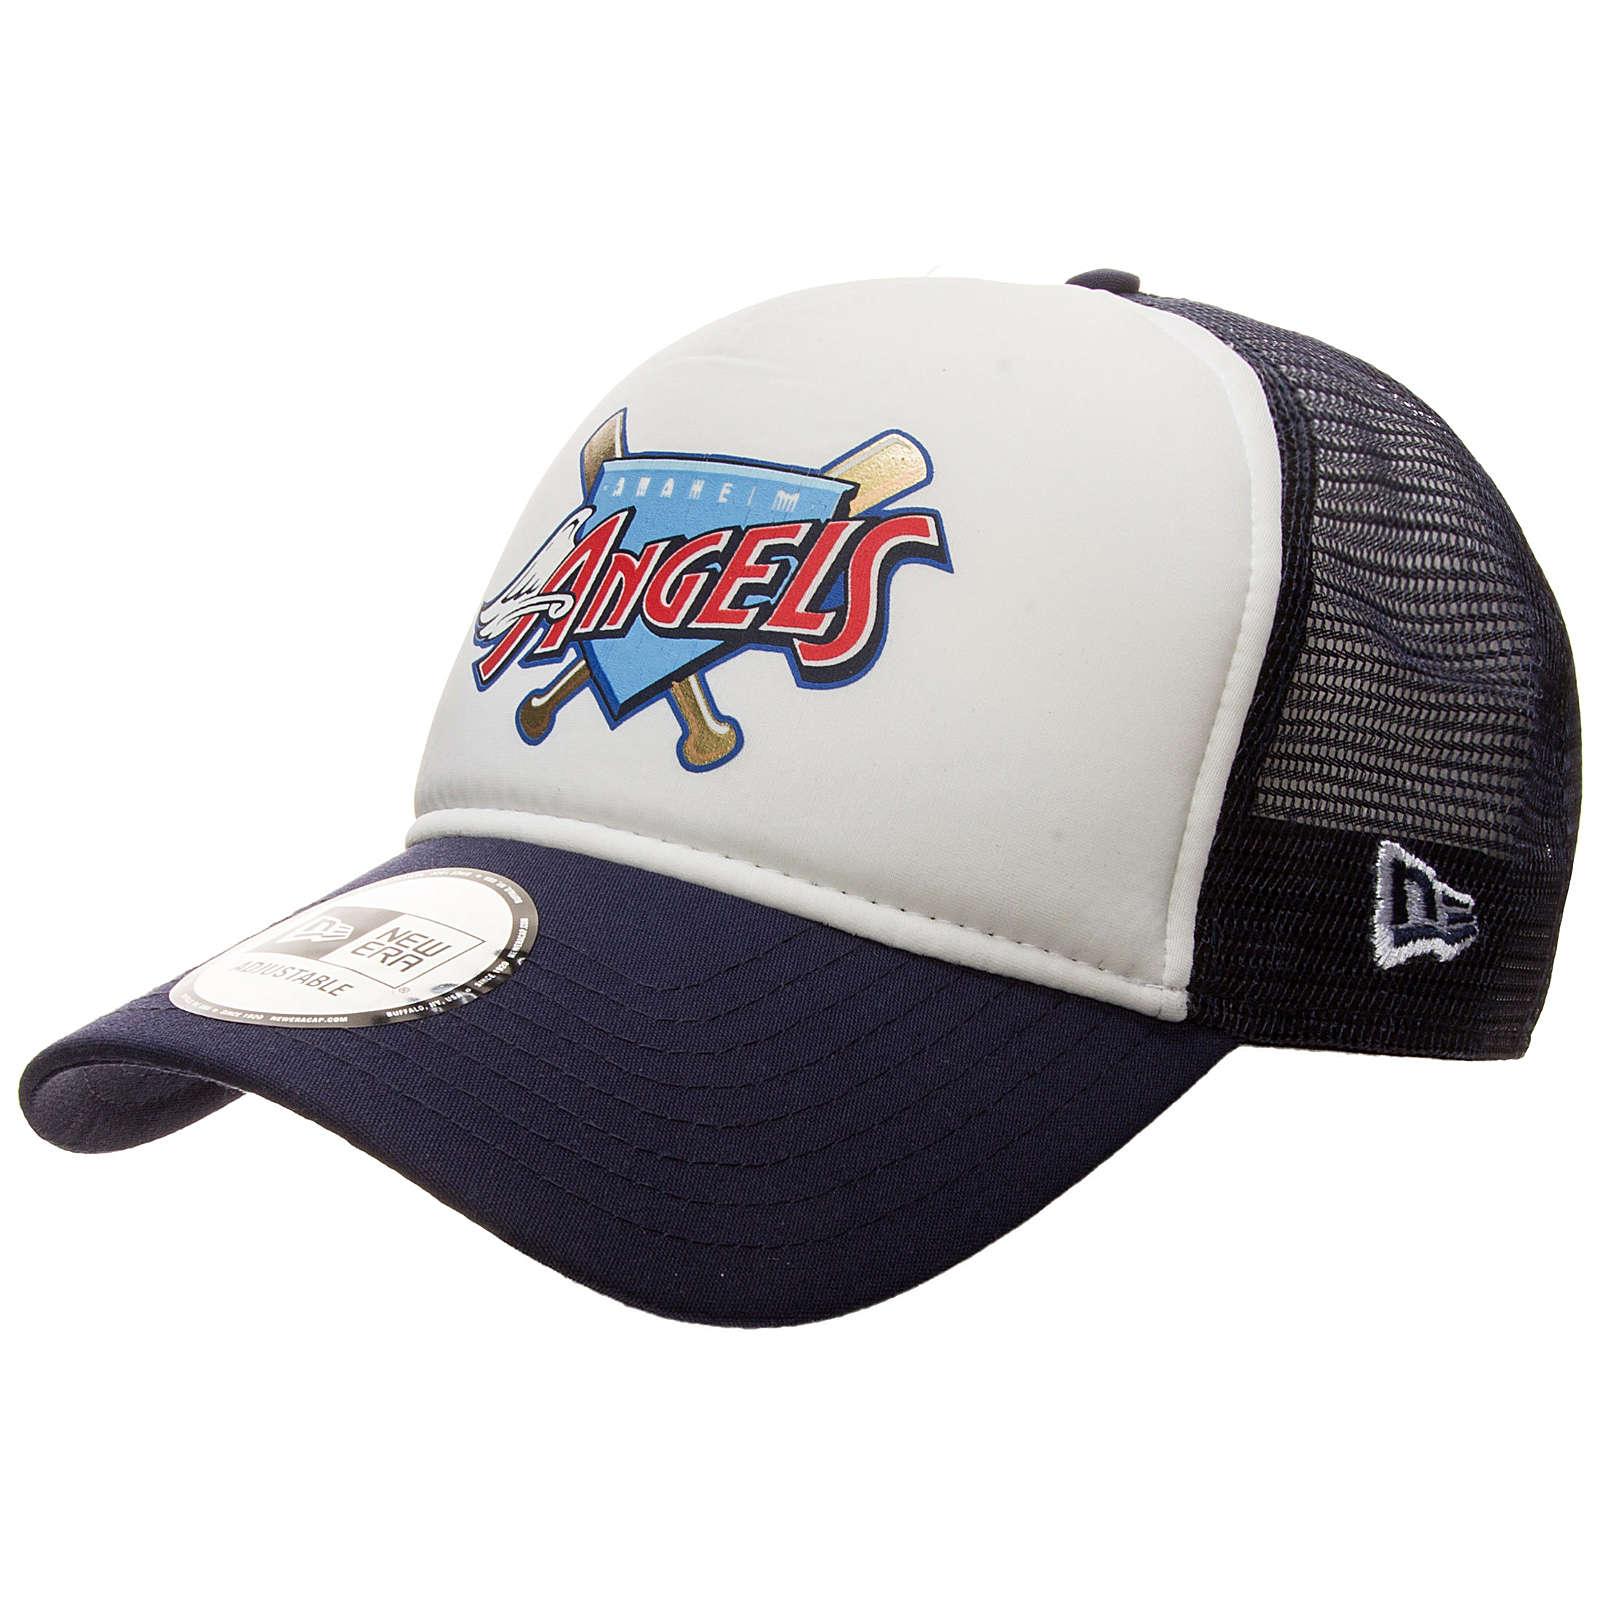 New Era 9FORTY MLB Anaheim Angels Trucker Caps ...